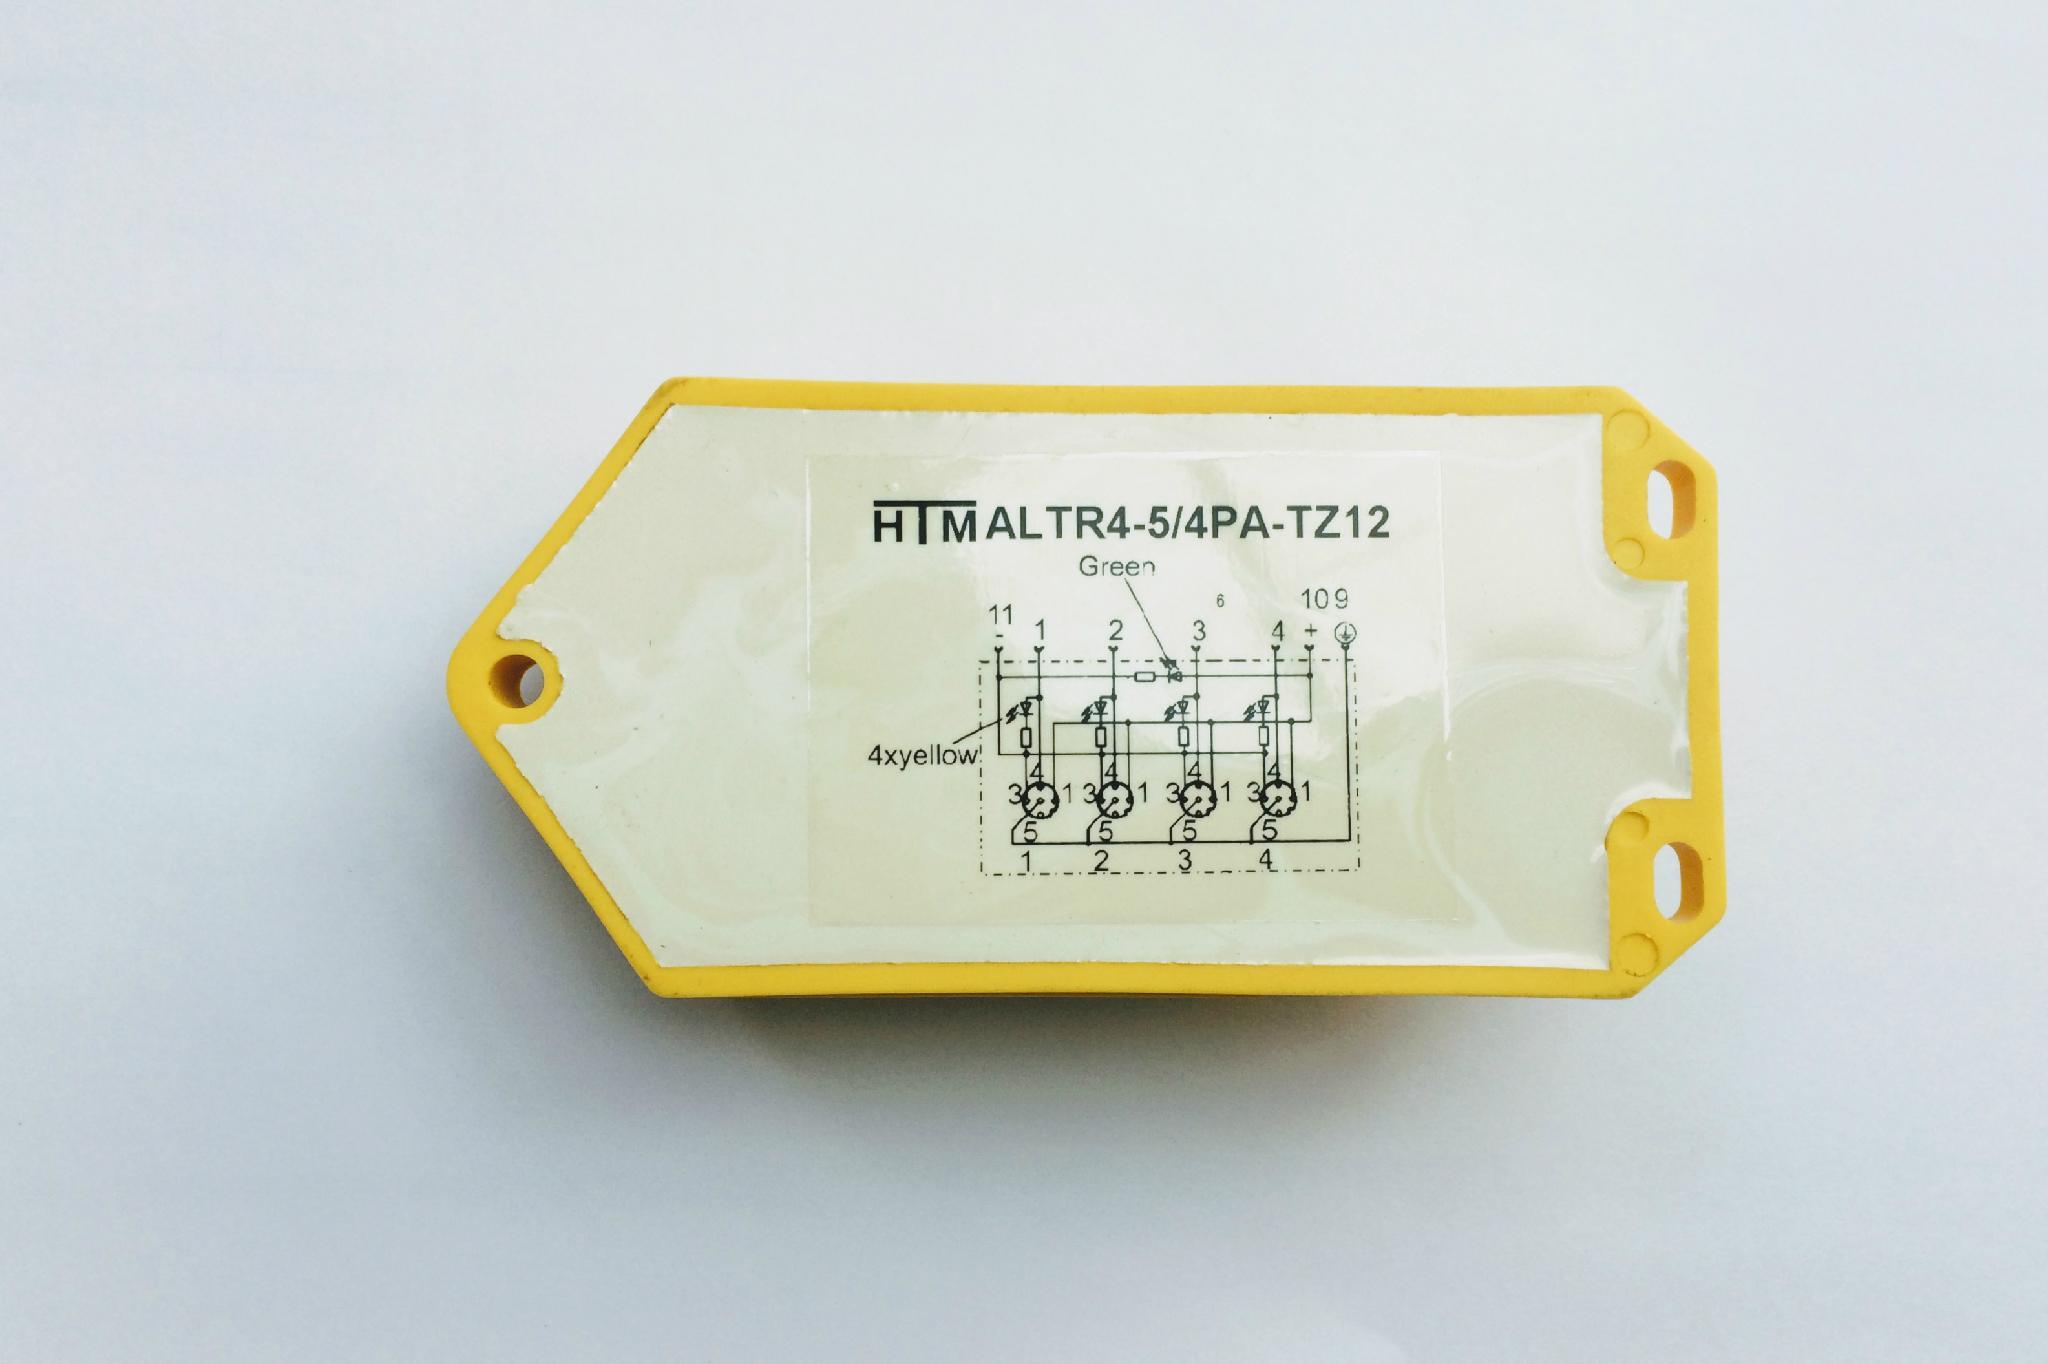 美国HTM传感器ALTR4-5/4PA-TZ12 2